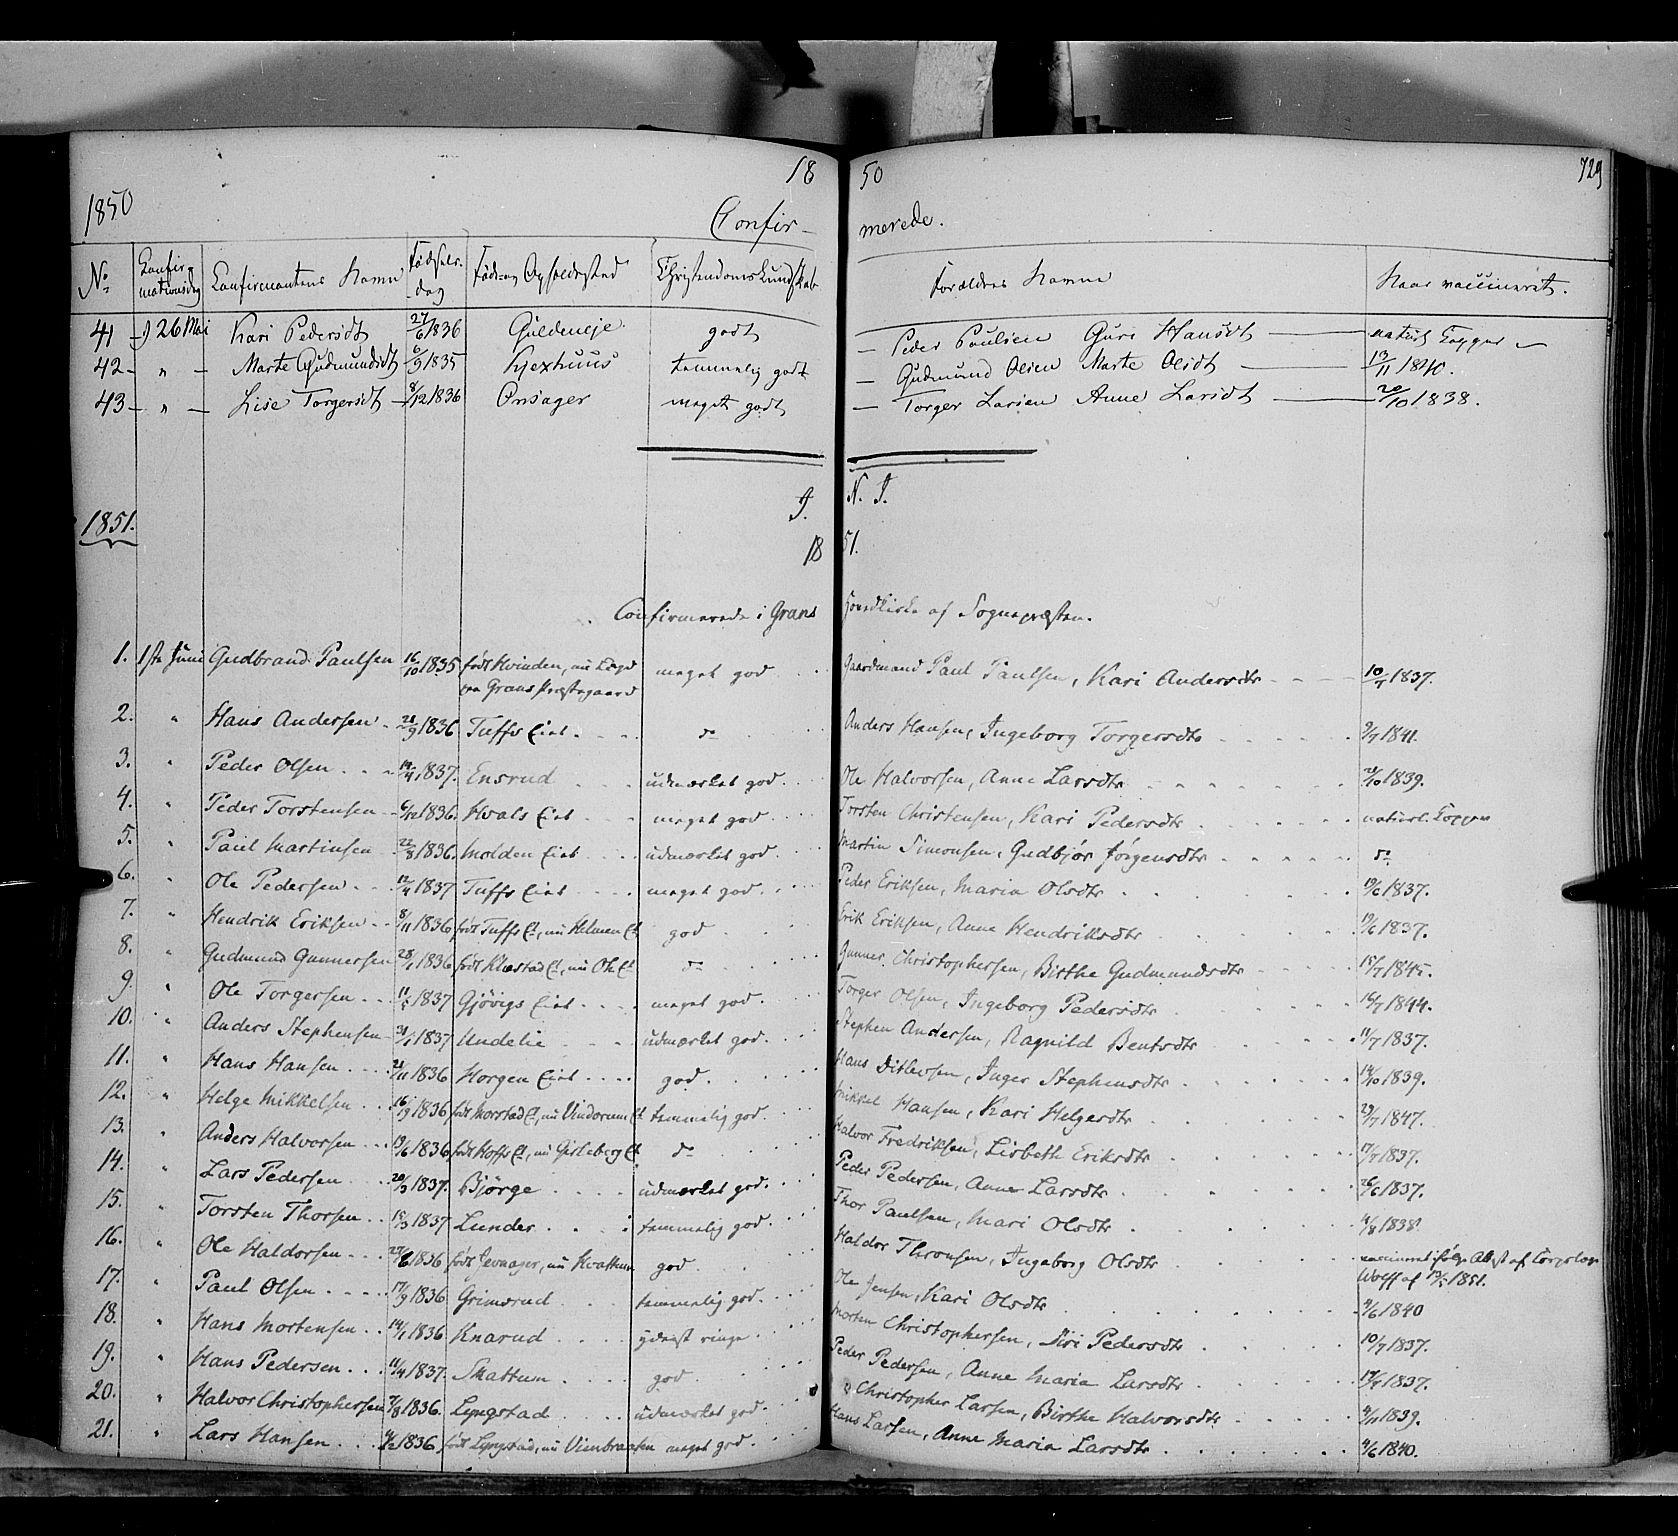 SAH, Gran prestekontor, Ministerialbok nr. 11, 1842-1856, s. 728-729